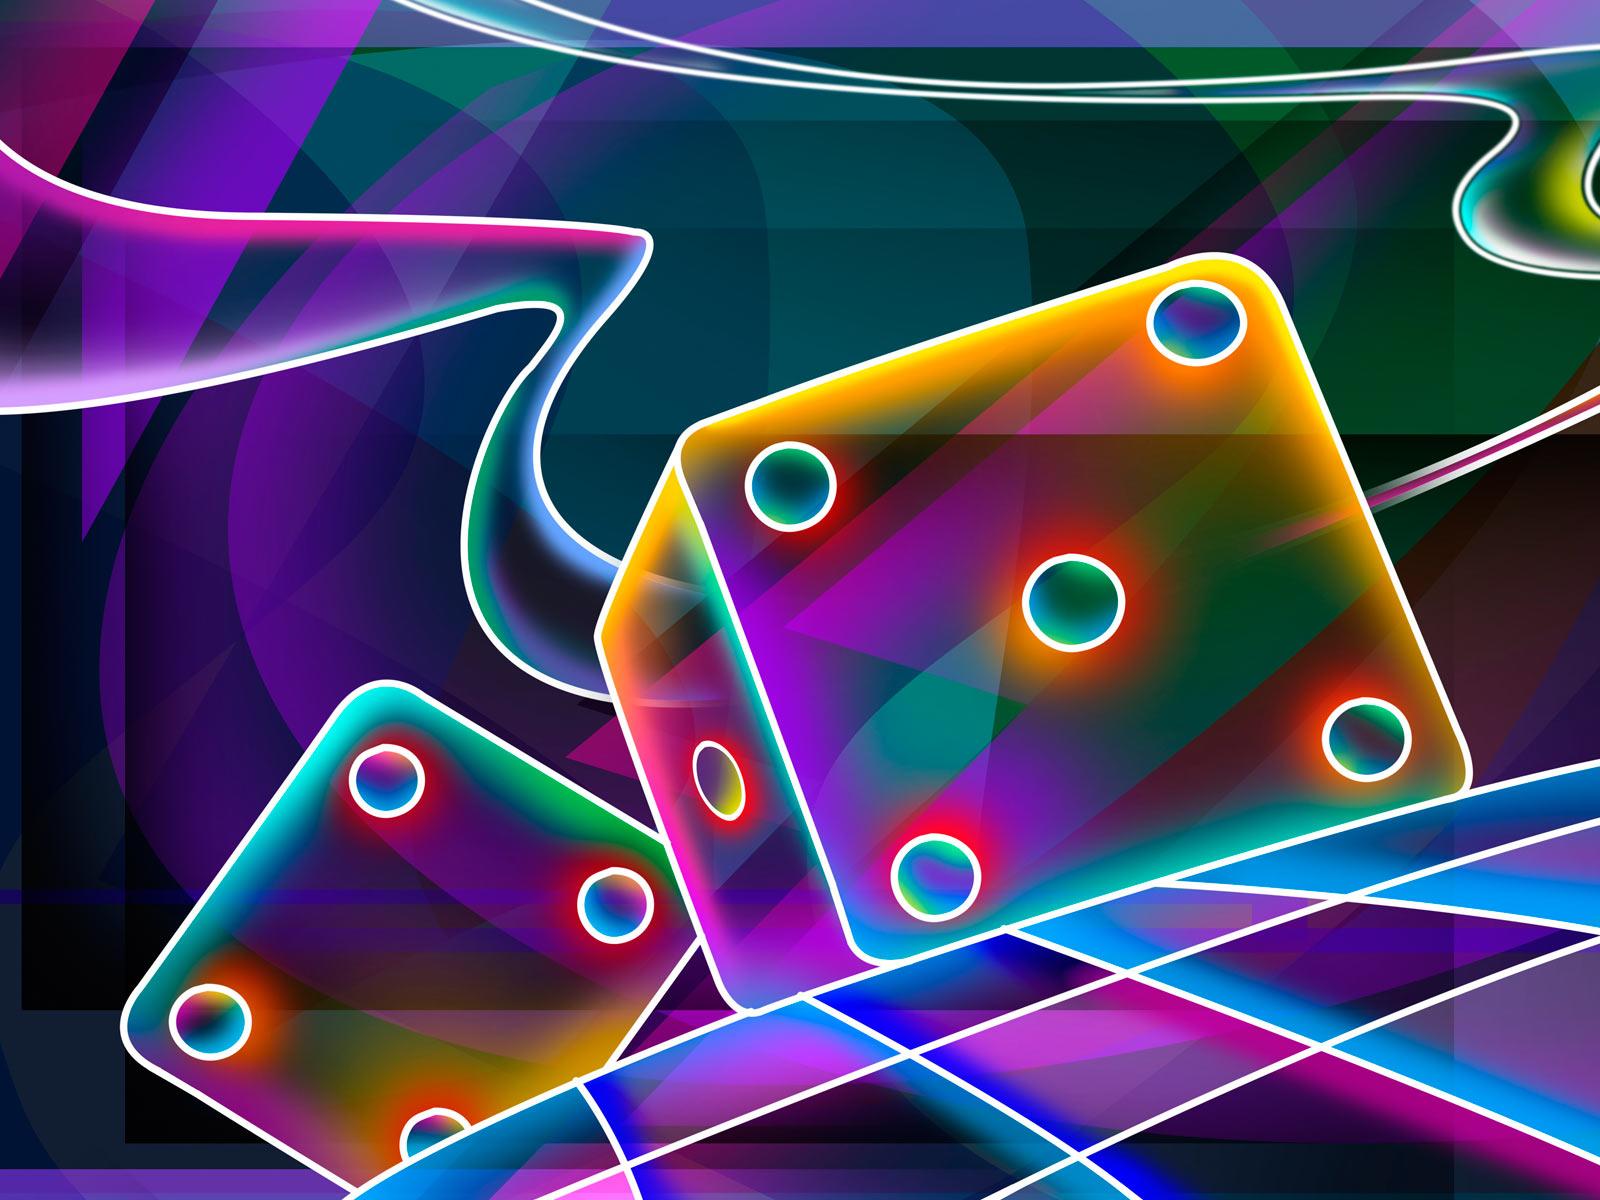 Papel De Parede Dados Em Neon Wallpaper Para Download No